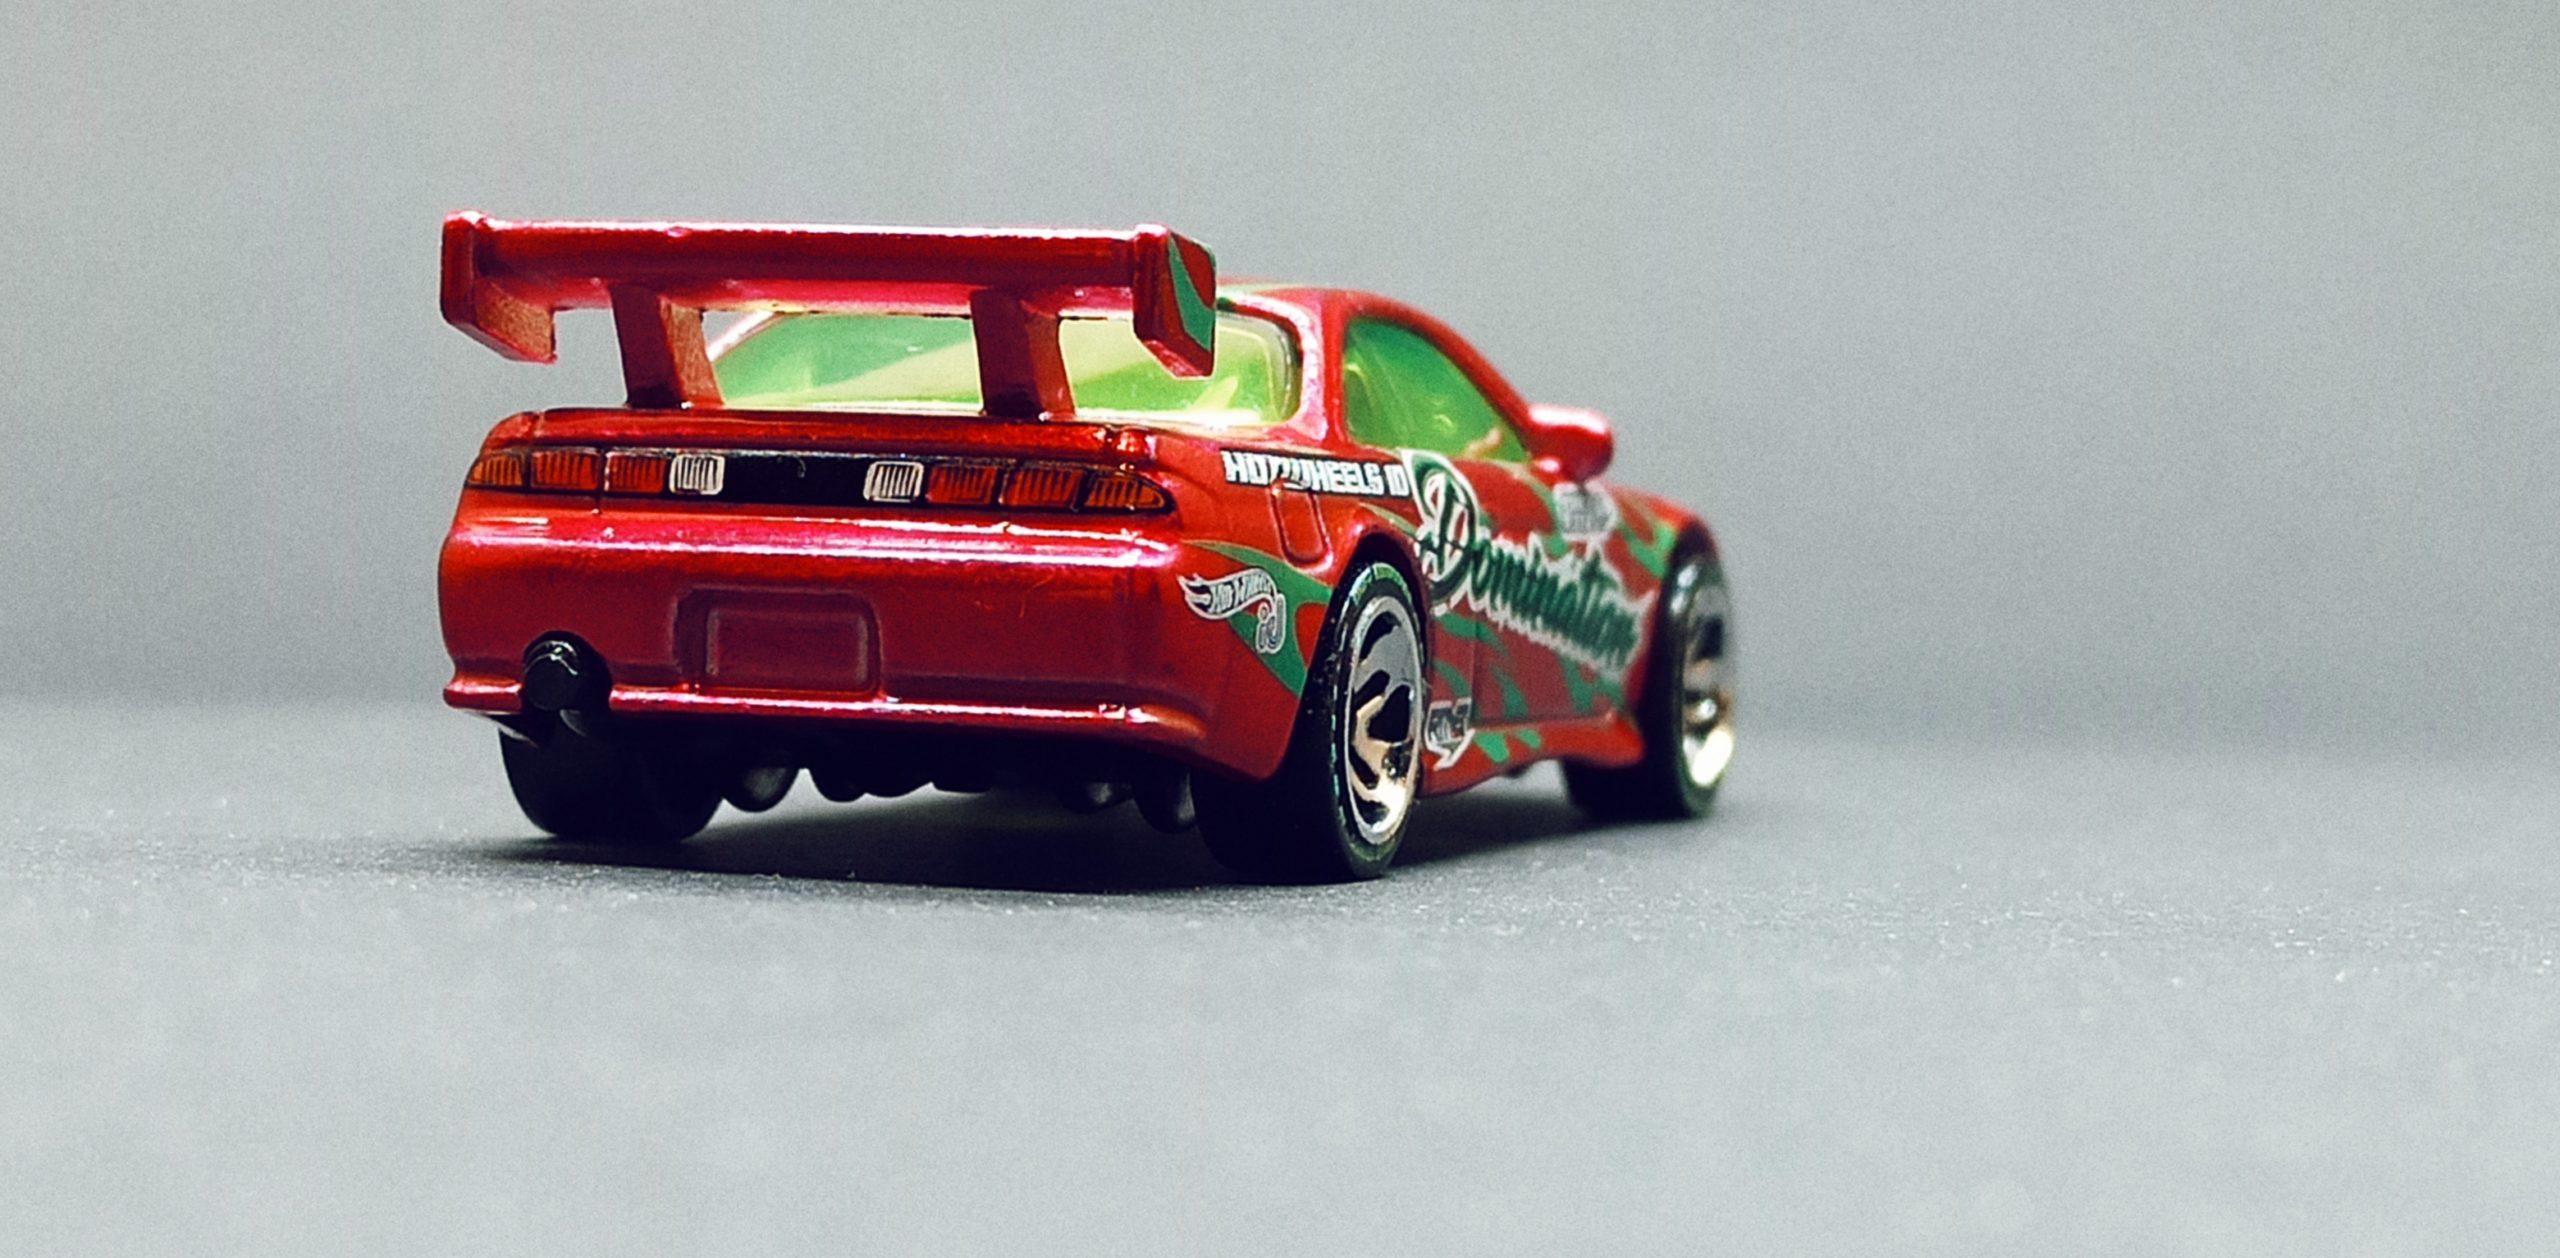 Hot Wheels id Nissan Silvia (S14) Drift (HBG13) 2021 Drift Domination (03/04) spectraflame pink back angle